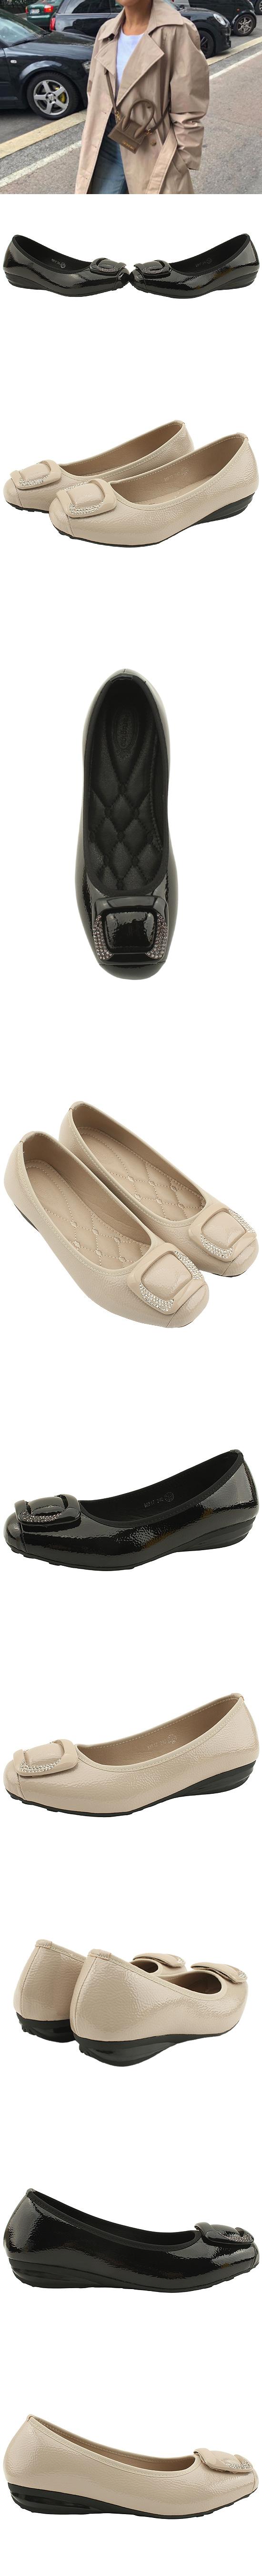 Feminine Cubic Wedge Heel Loafer Shoes Beige